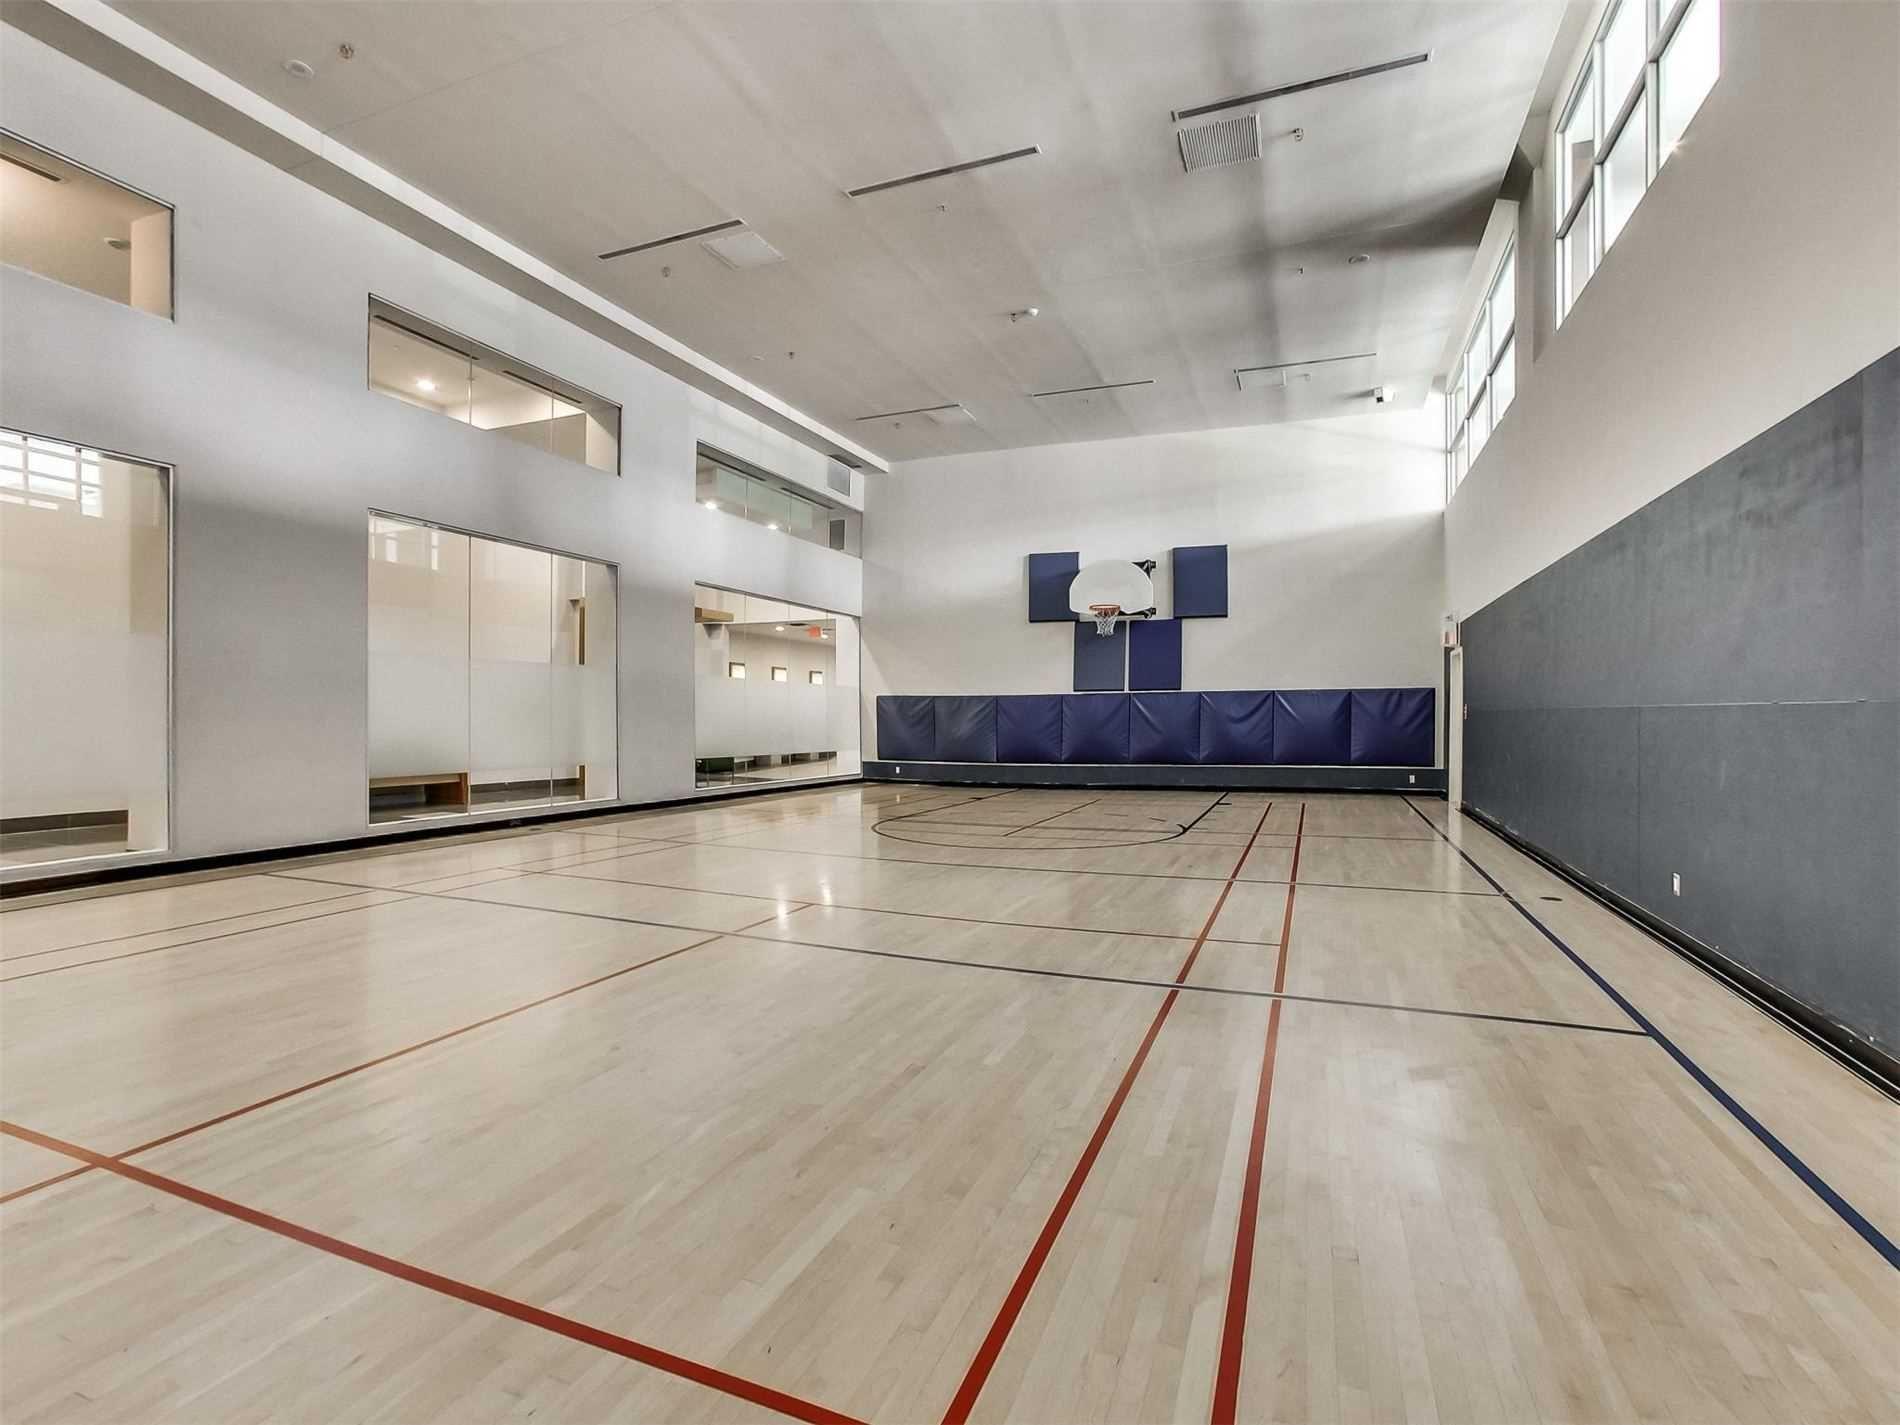 Photo 29: Photos: 1708 361 W Front Street in Toronto: Waterfront Communities C1 Condo for lease (Toronto C01)  : MLS®# C5087813